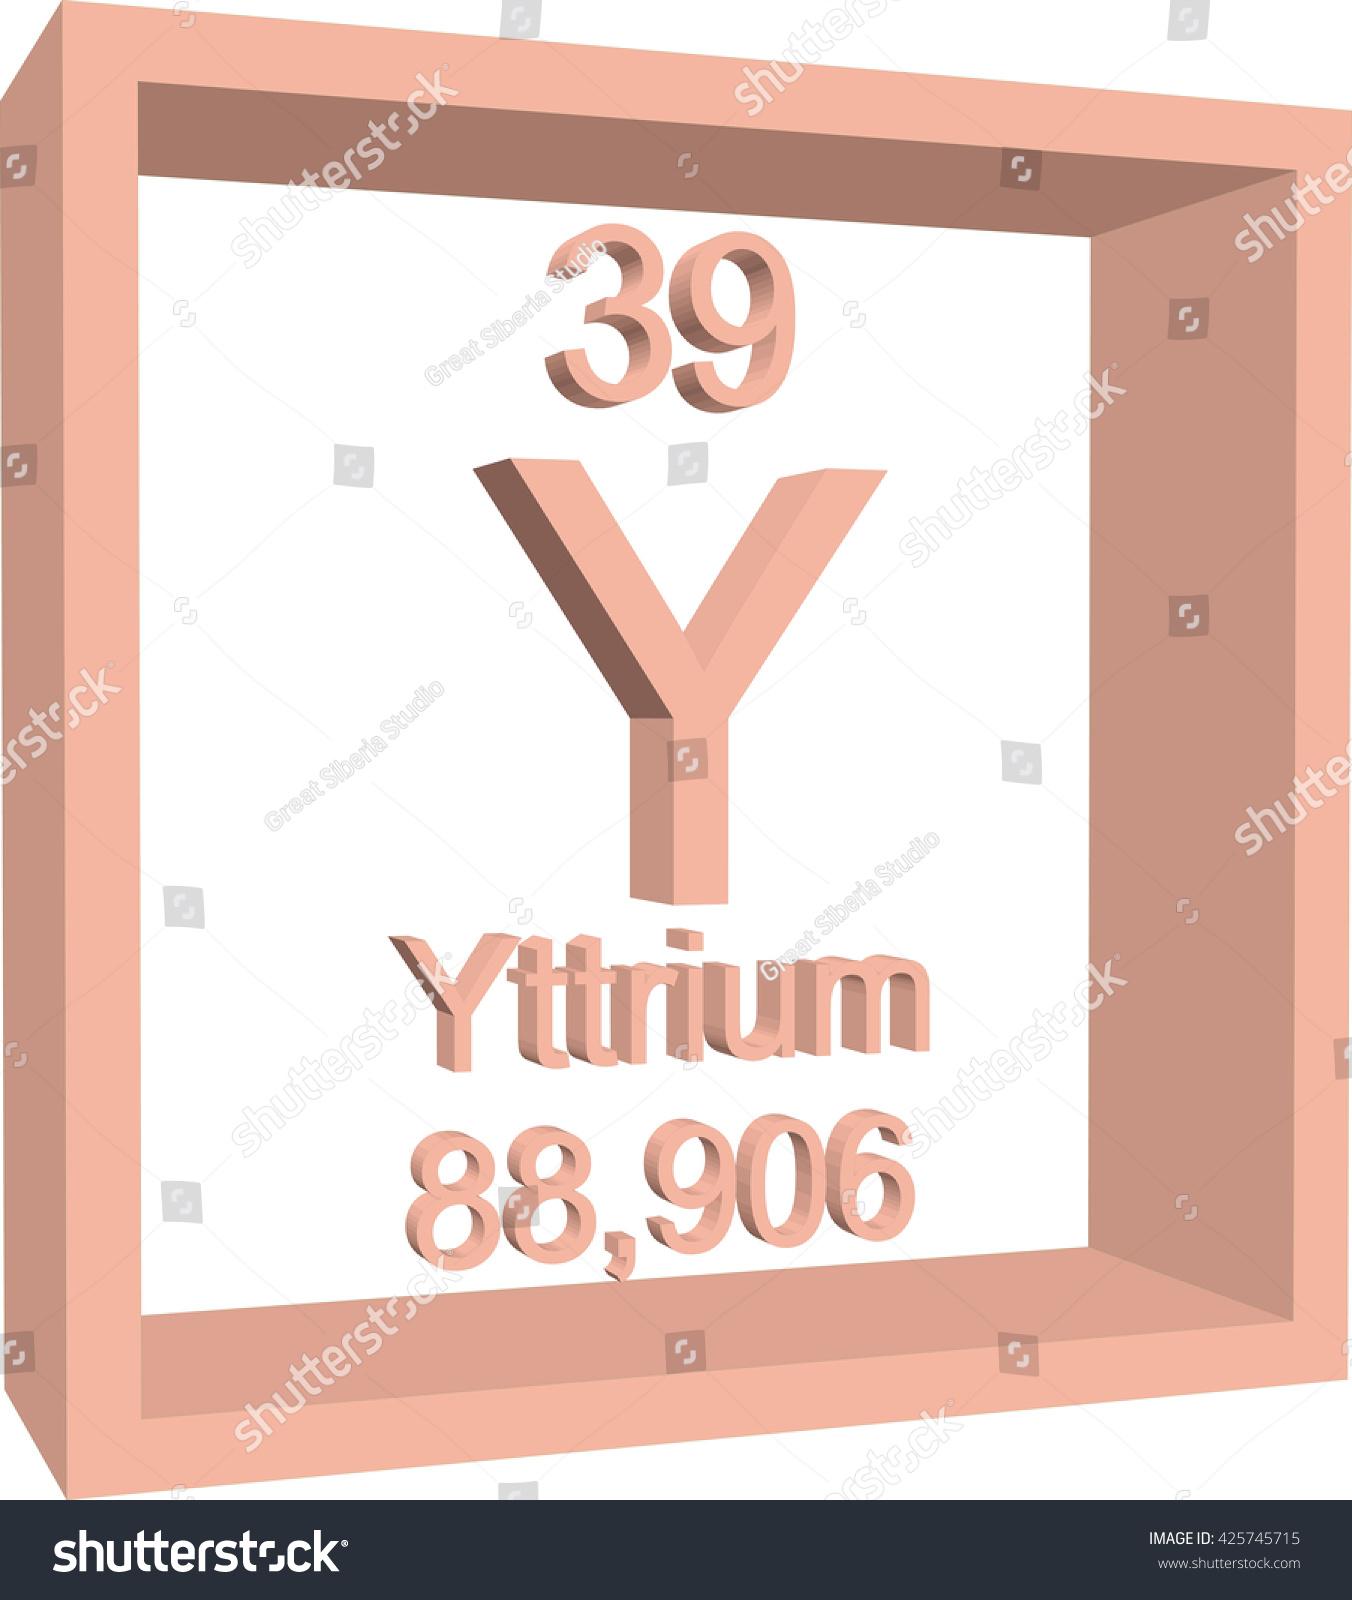 Periodic Table Elements Yttrium Stock Vector 425745715 ...